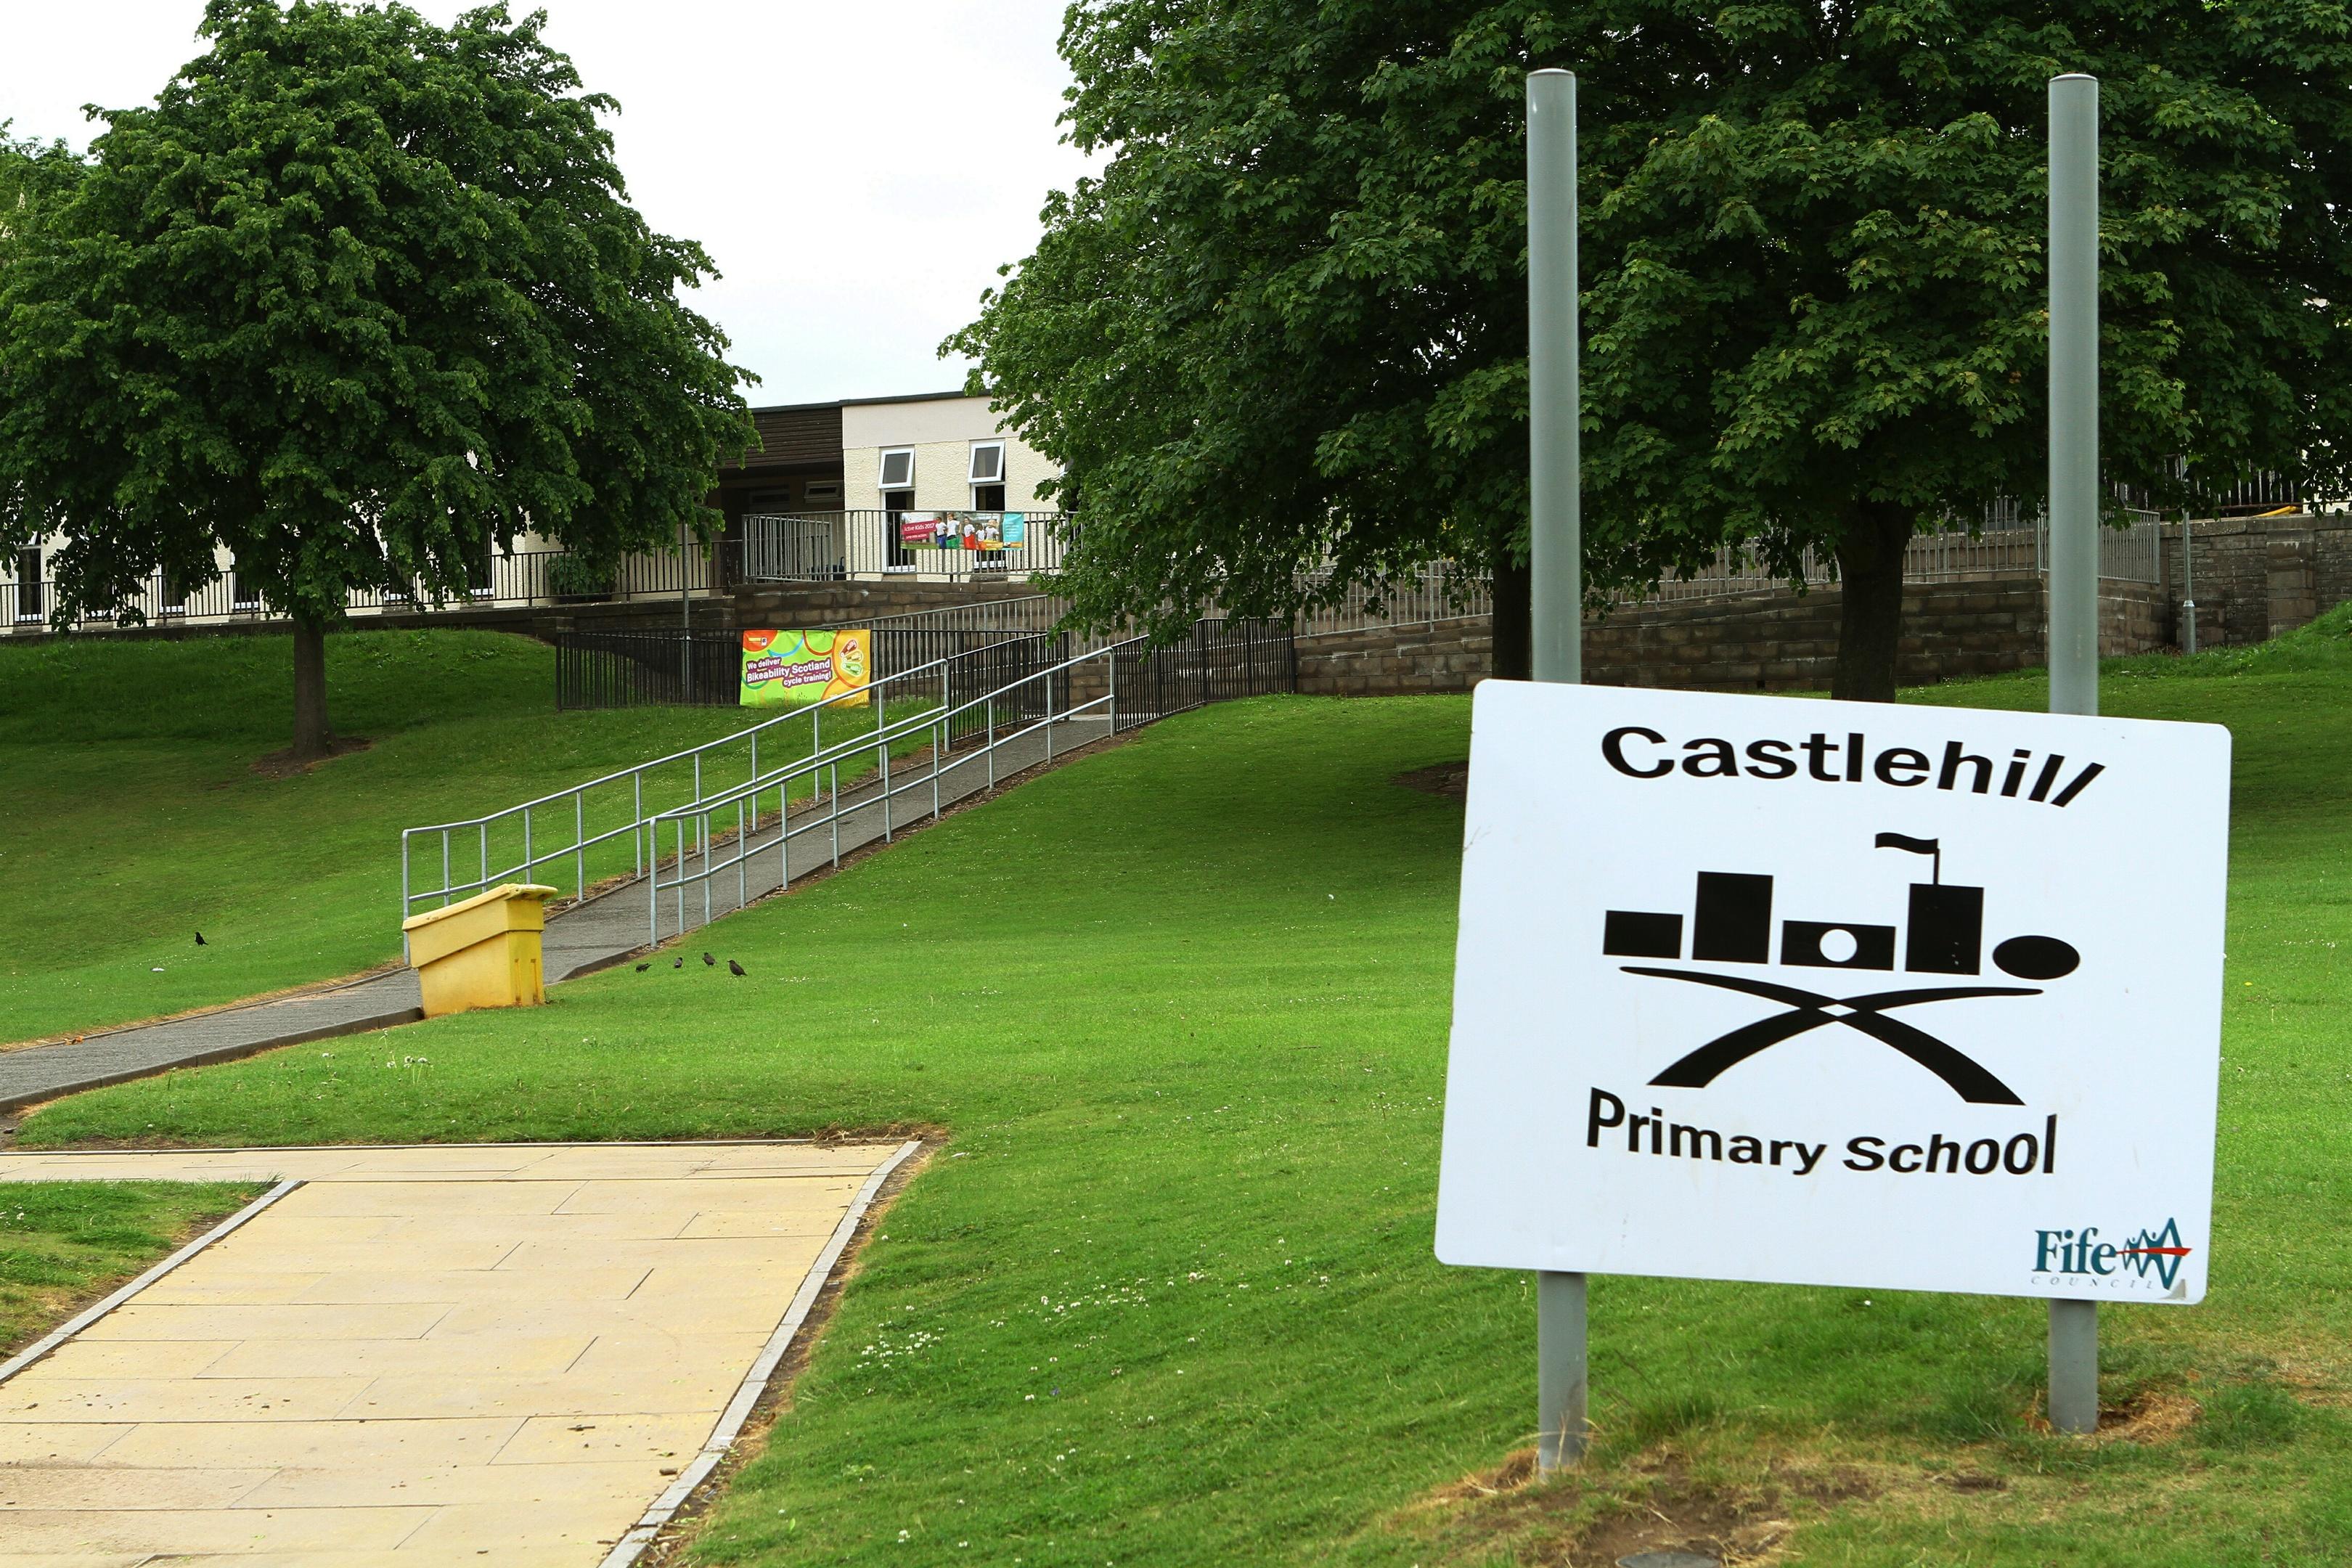 Castlehill Primary School